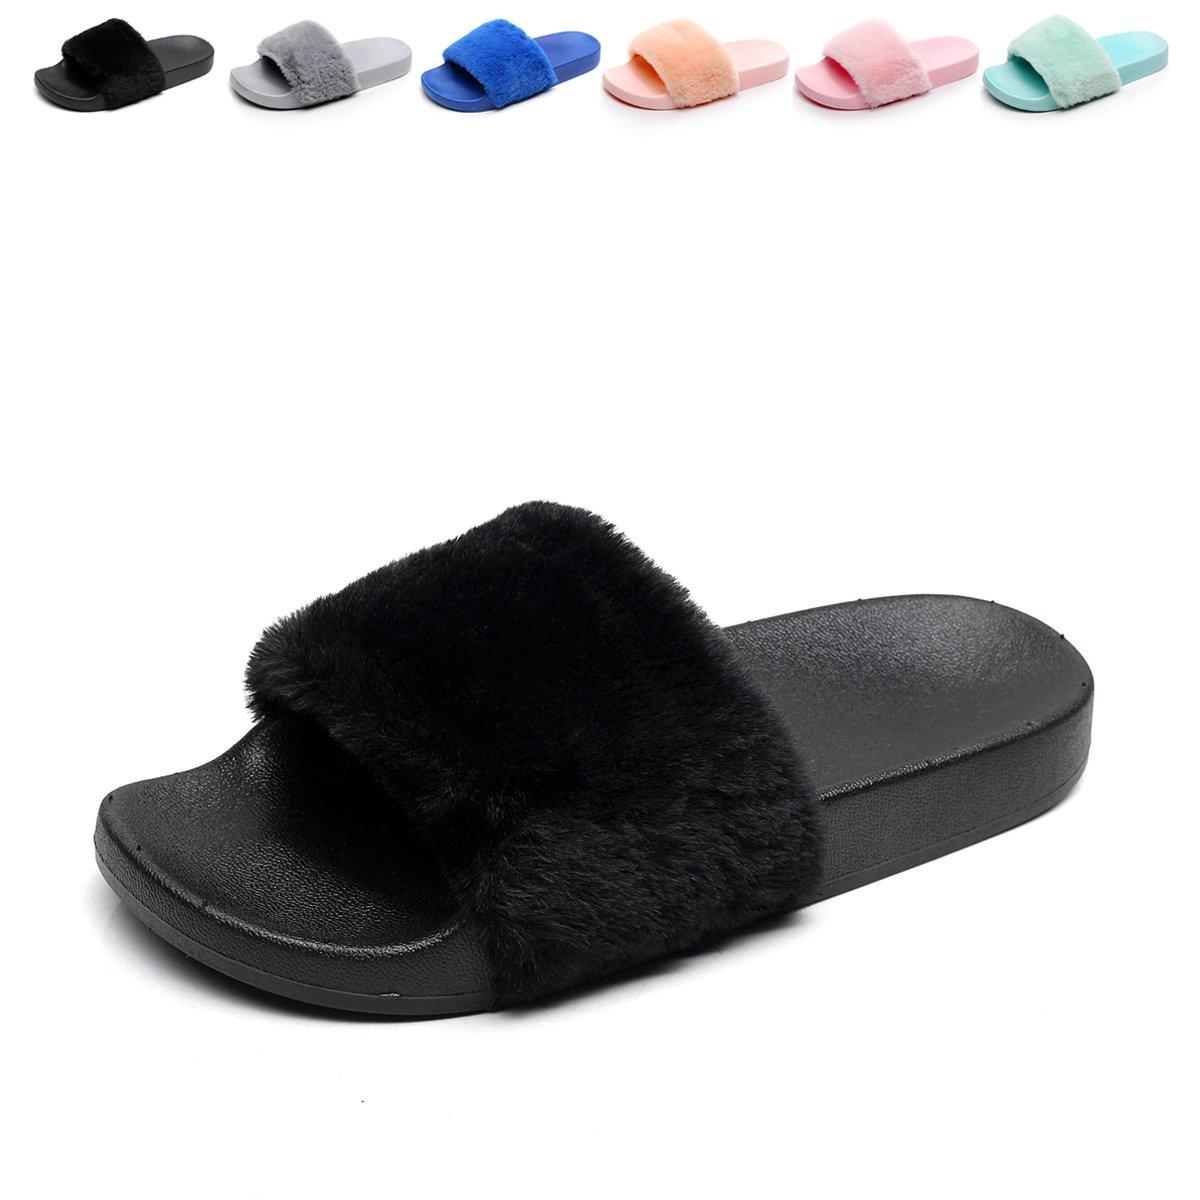 ecb5470d932e Amazon.com  HAVINA Women s Faux Fur Slippers Soft Slide Flat Flip Flops   Shoes